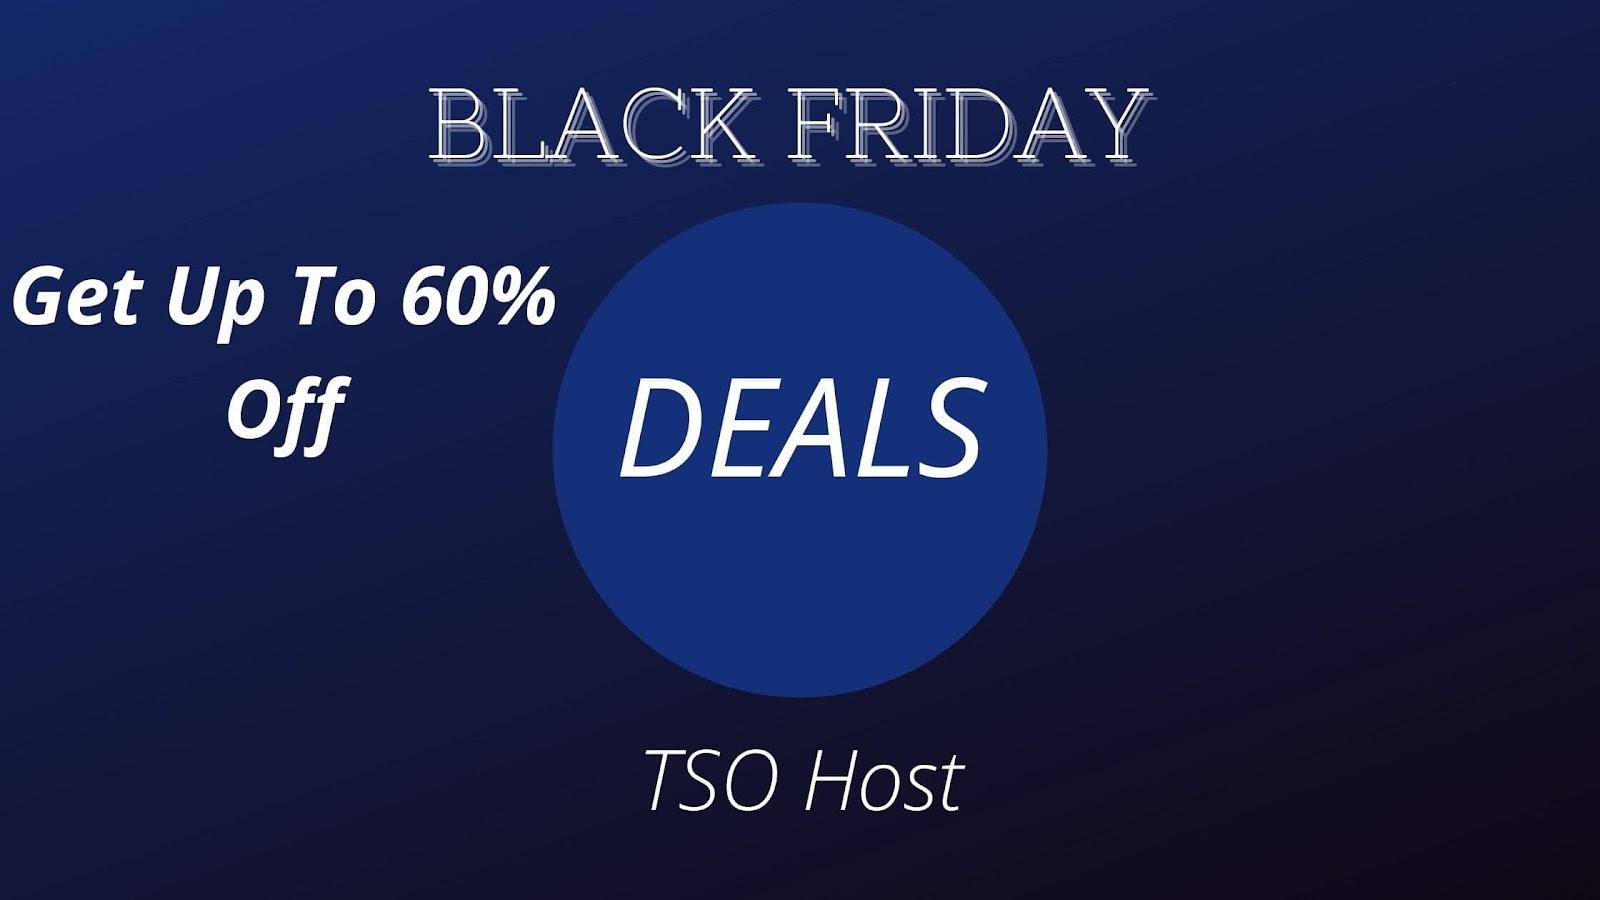 TSO Host- Discounts Up To 60%